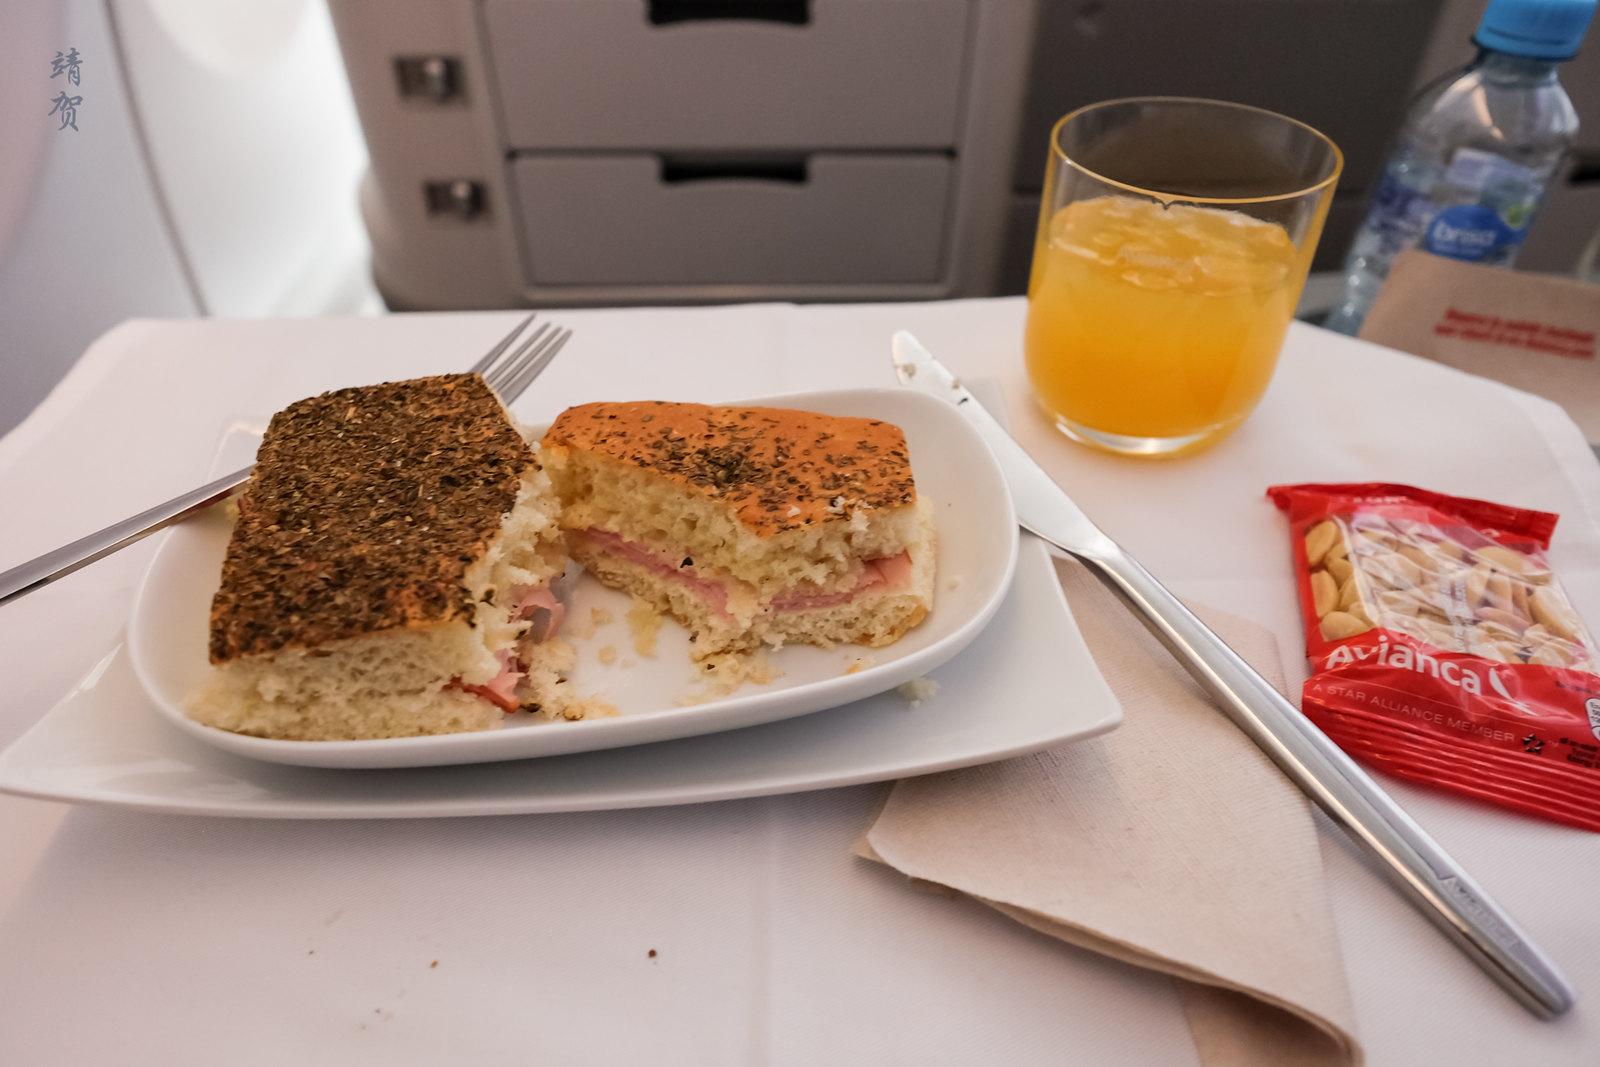 Sandwich served mid-flight